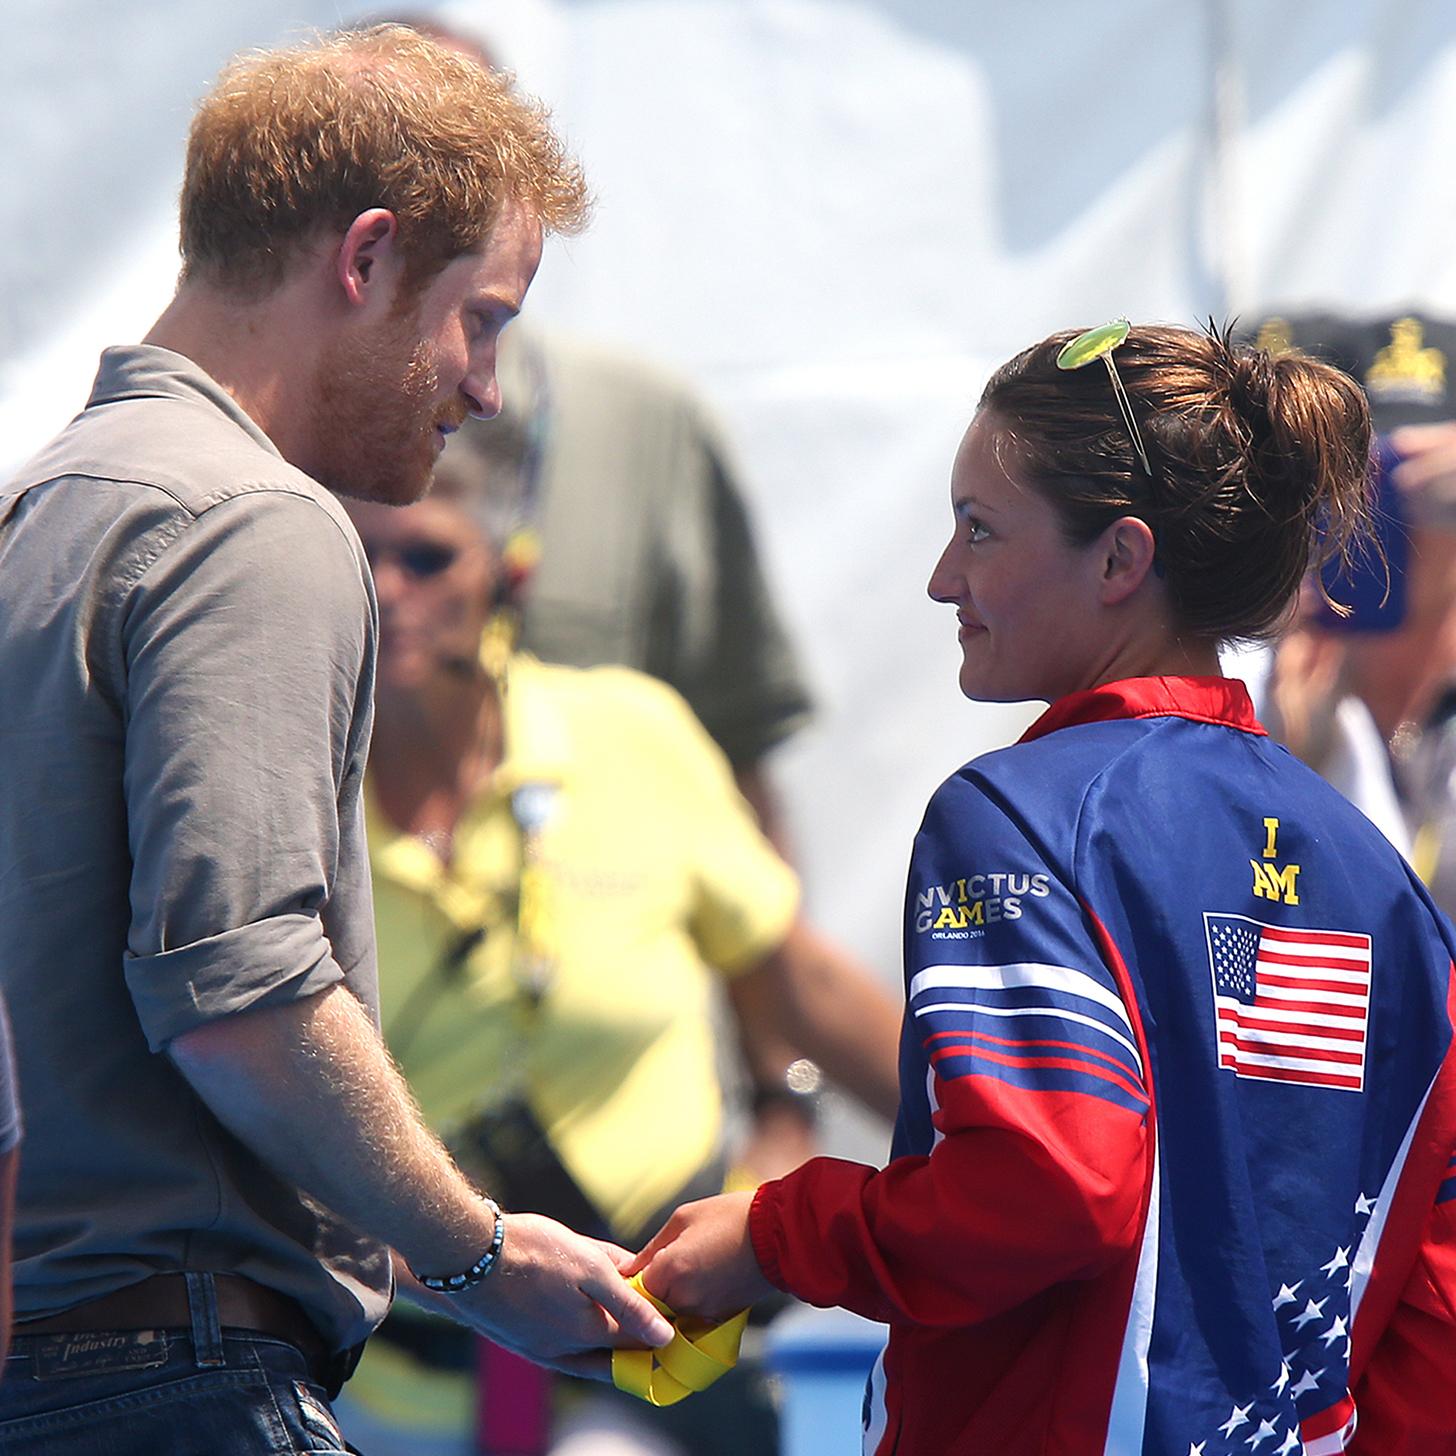 Veteran Returns Medal To Prince Harry (Video)